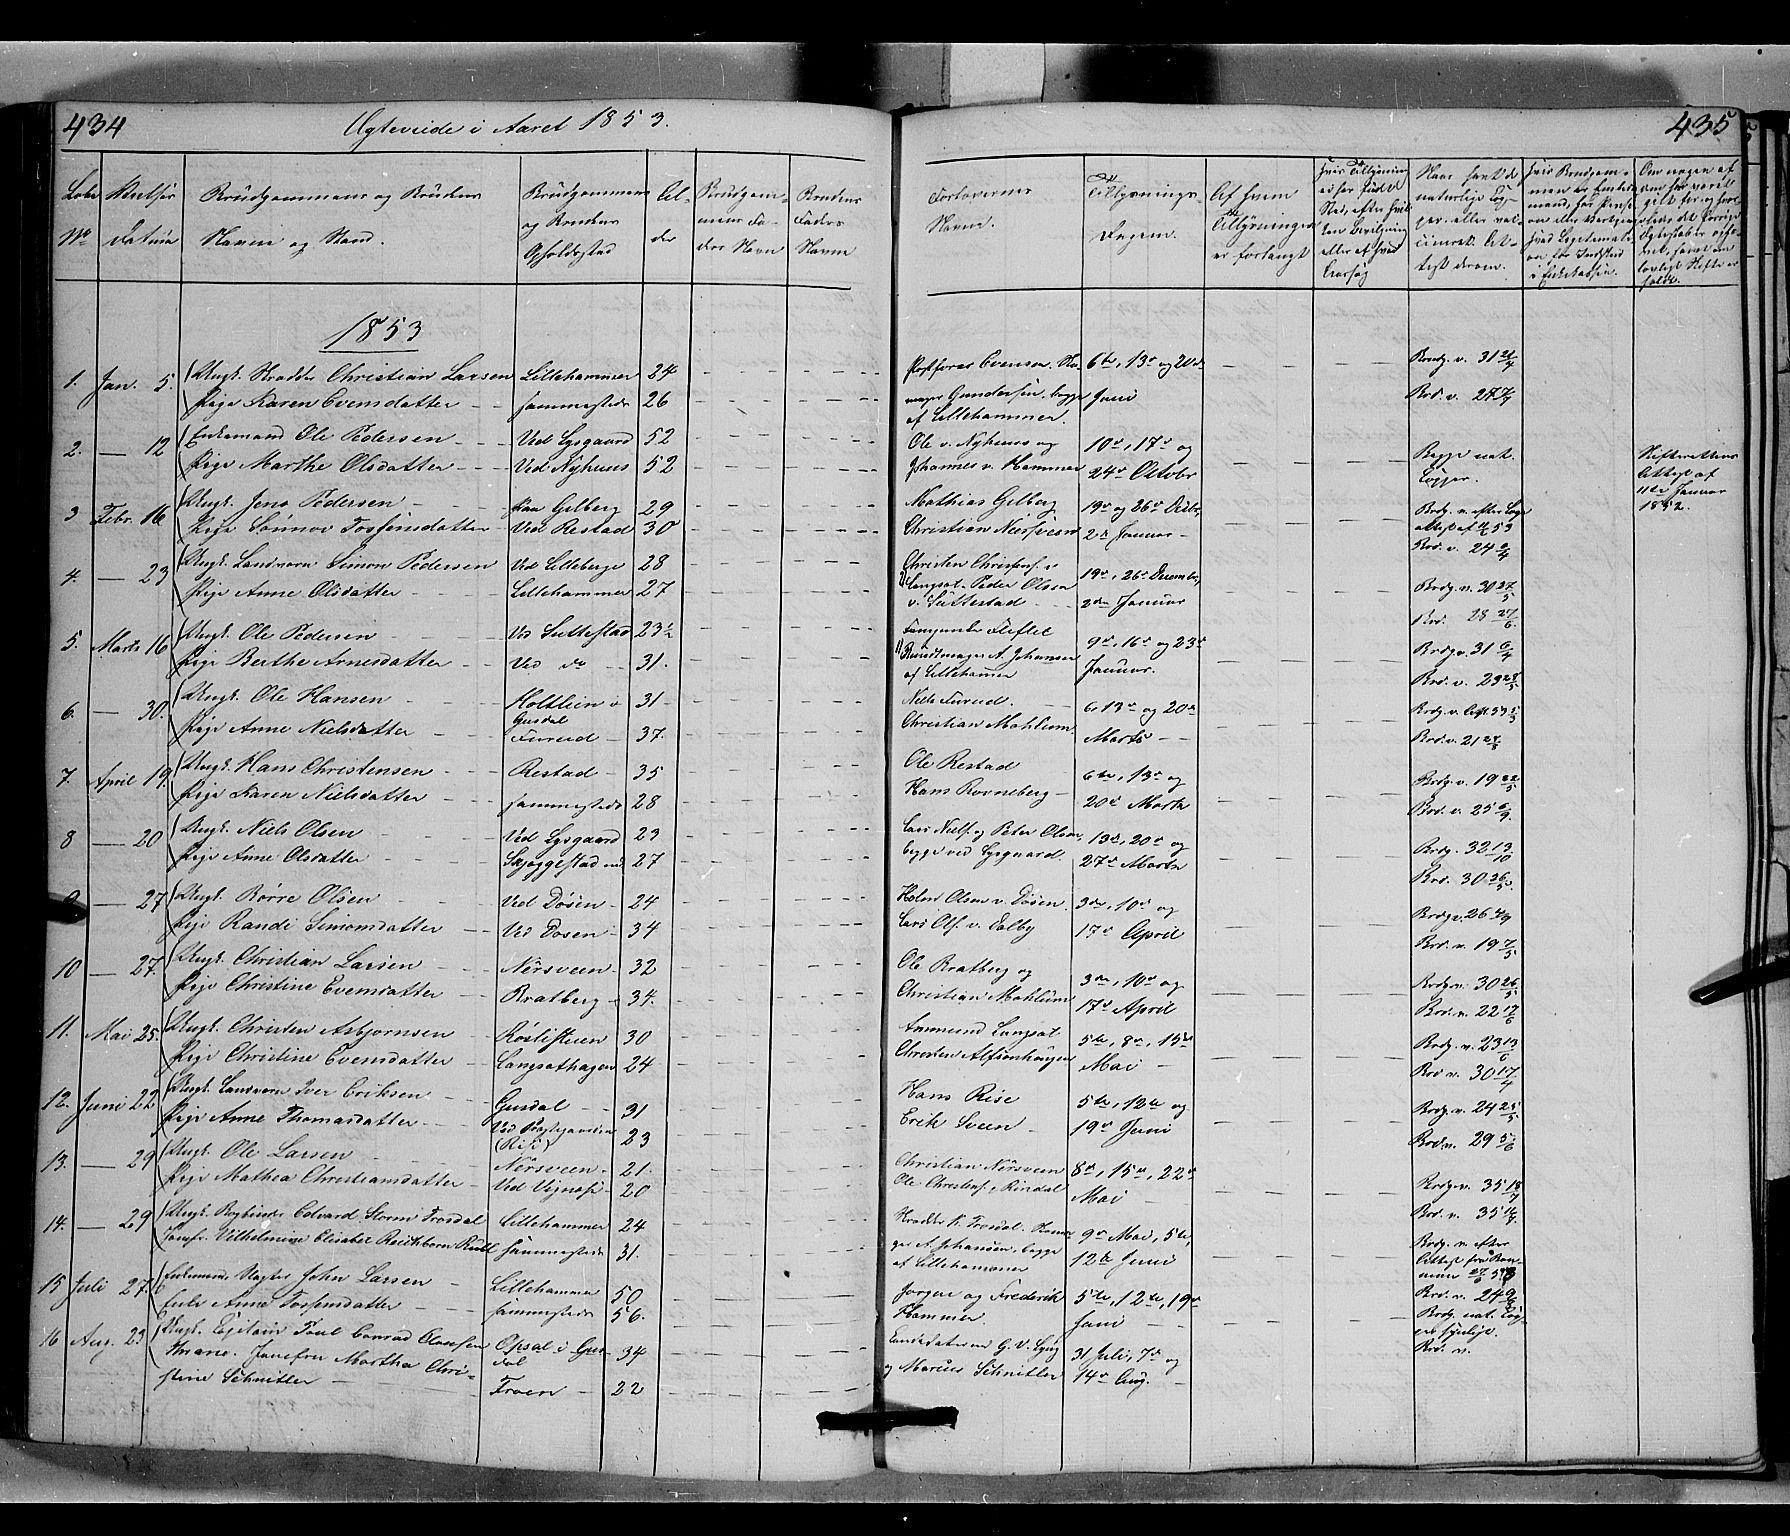 SAH, Fåberg prestekontor, Klokkerbok nr. 6, 1837-1855, s. 434-435